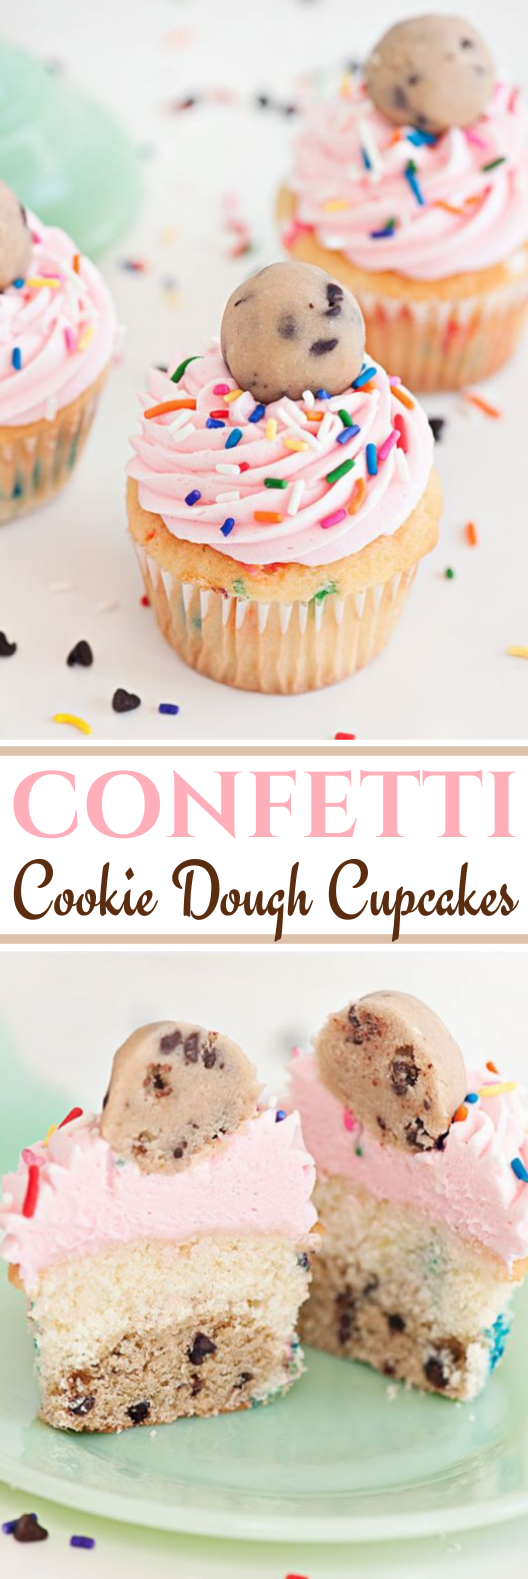 Cookie Dough Cupcakes #desserts #cake #baking #cupcakes #cookiedough